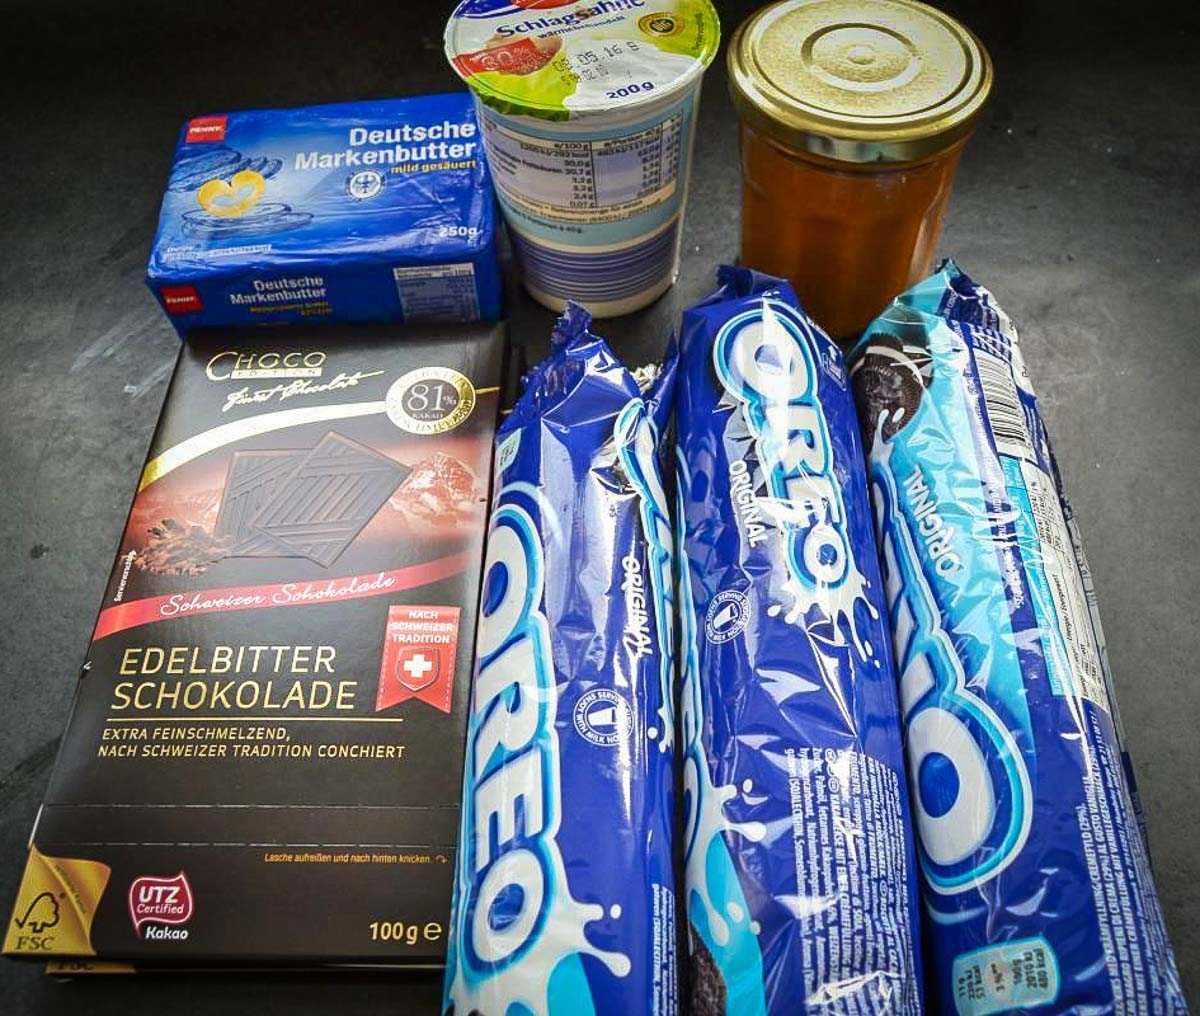 Zutaten Oreo Kekse, Schokolade, Dulce de Leche